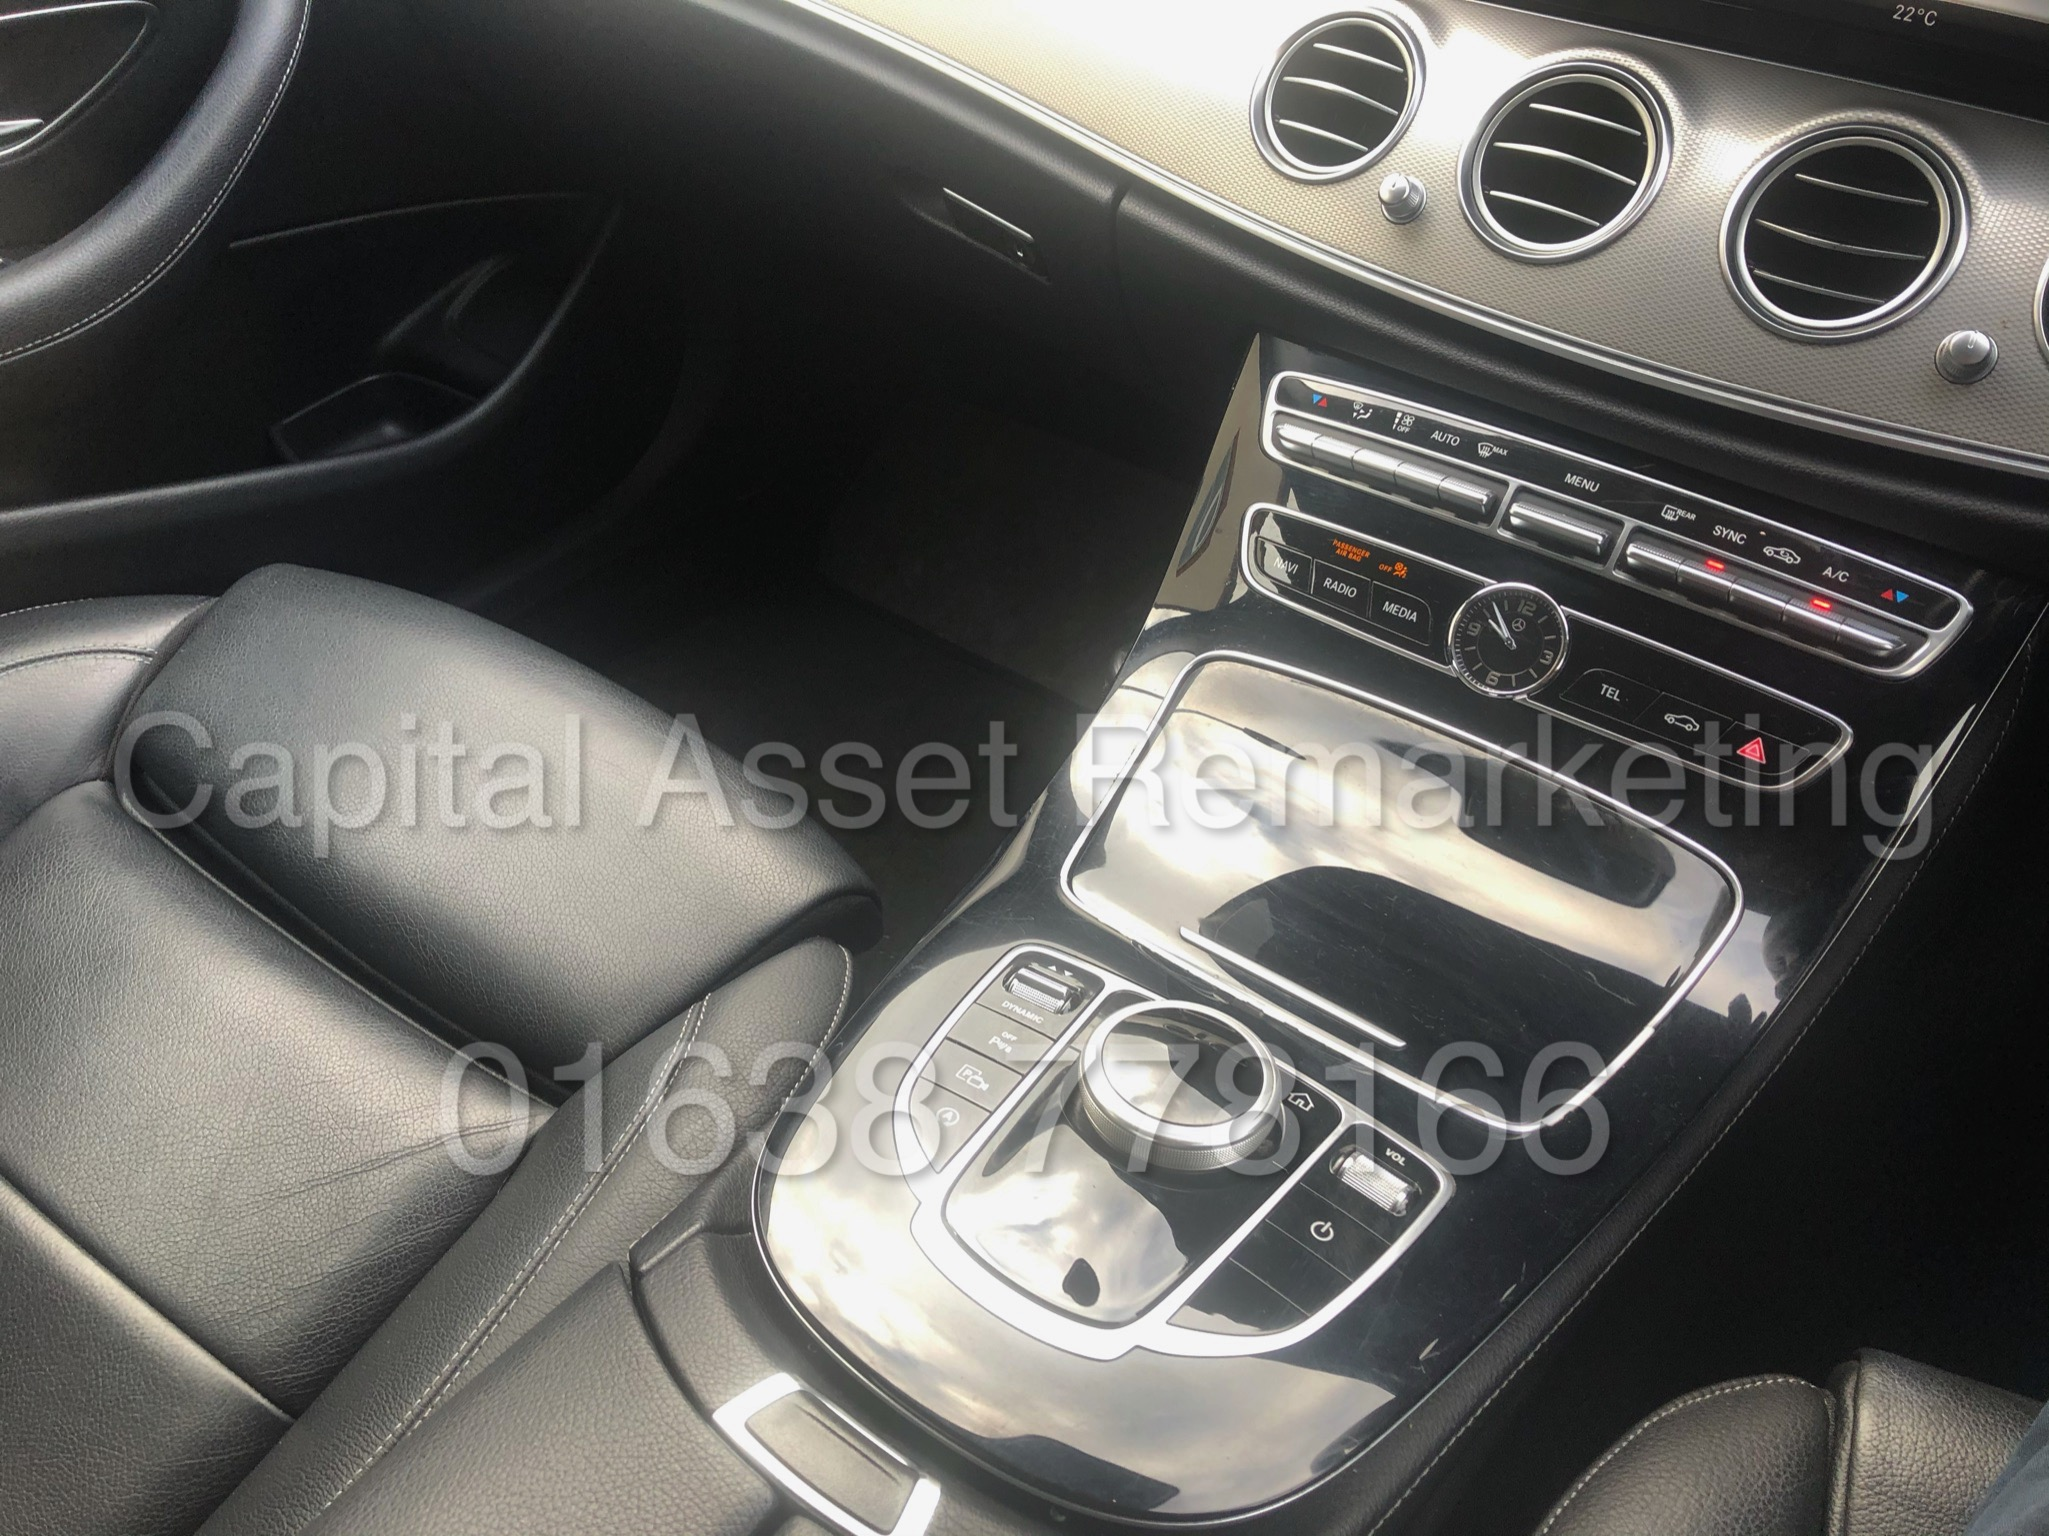 MERCEDES-BENZ E220D *SALOON* (2018 - NEW MODEL) '9-G TRONIC AUTO - LEATHER - SAT NAV' *HUGE SPEC* - Image 14 of 20